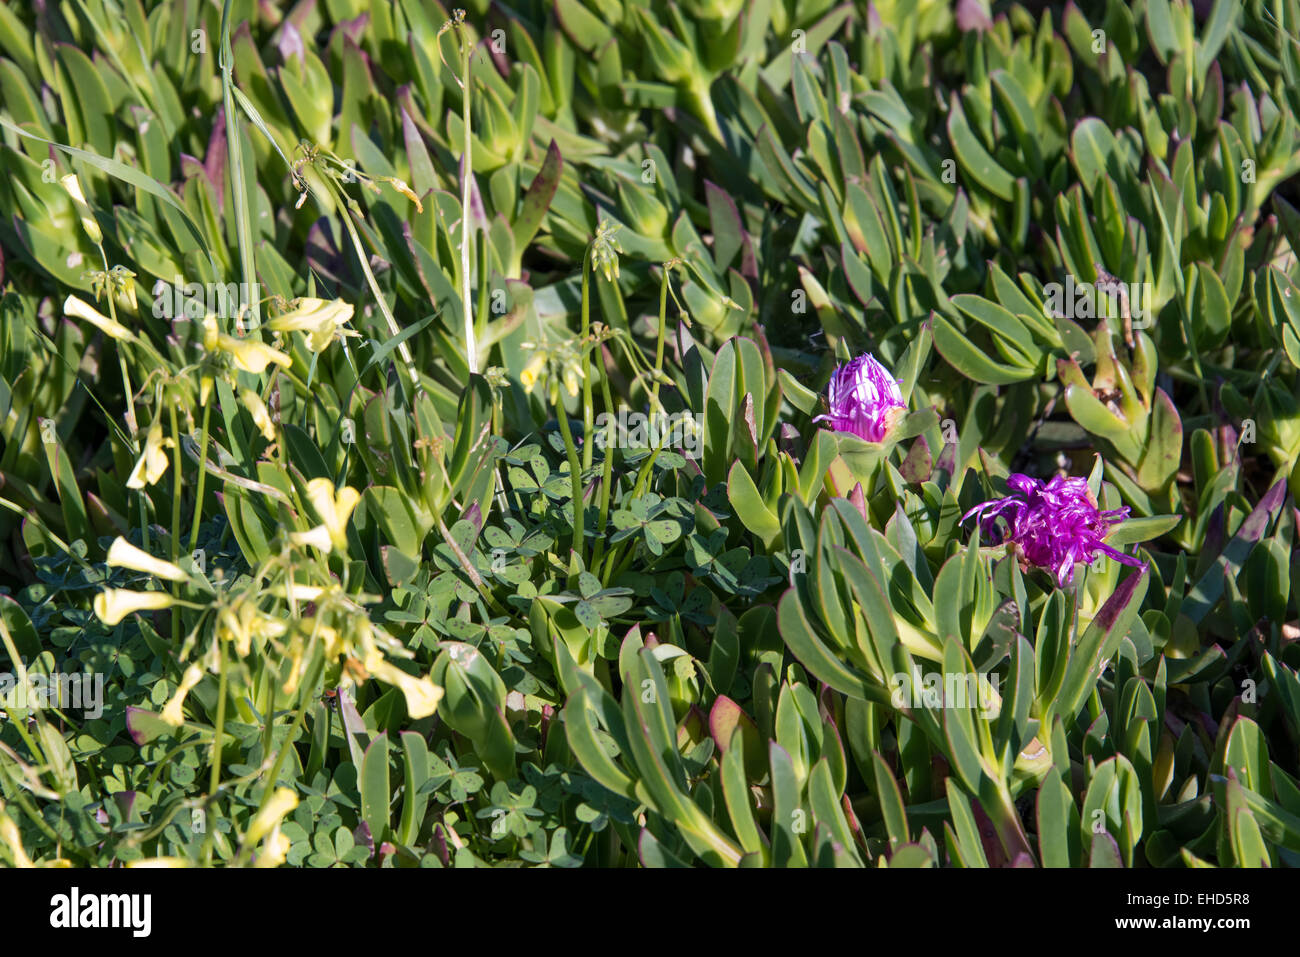 Purple Flowering Aloe Vera Plants And Yellow Wild Flowers Stock